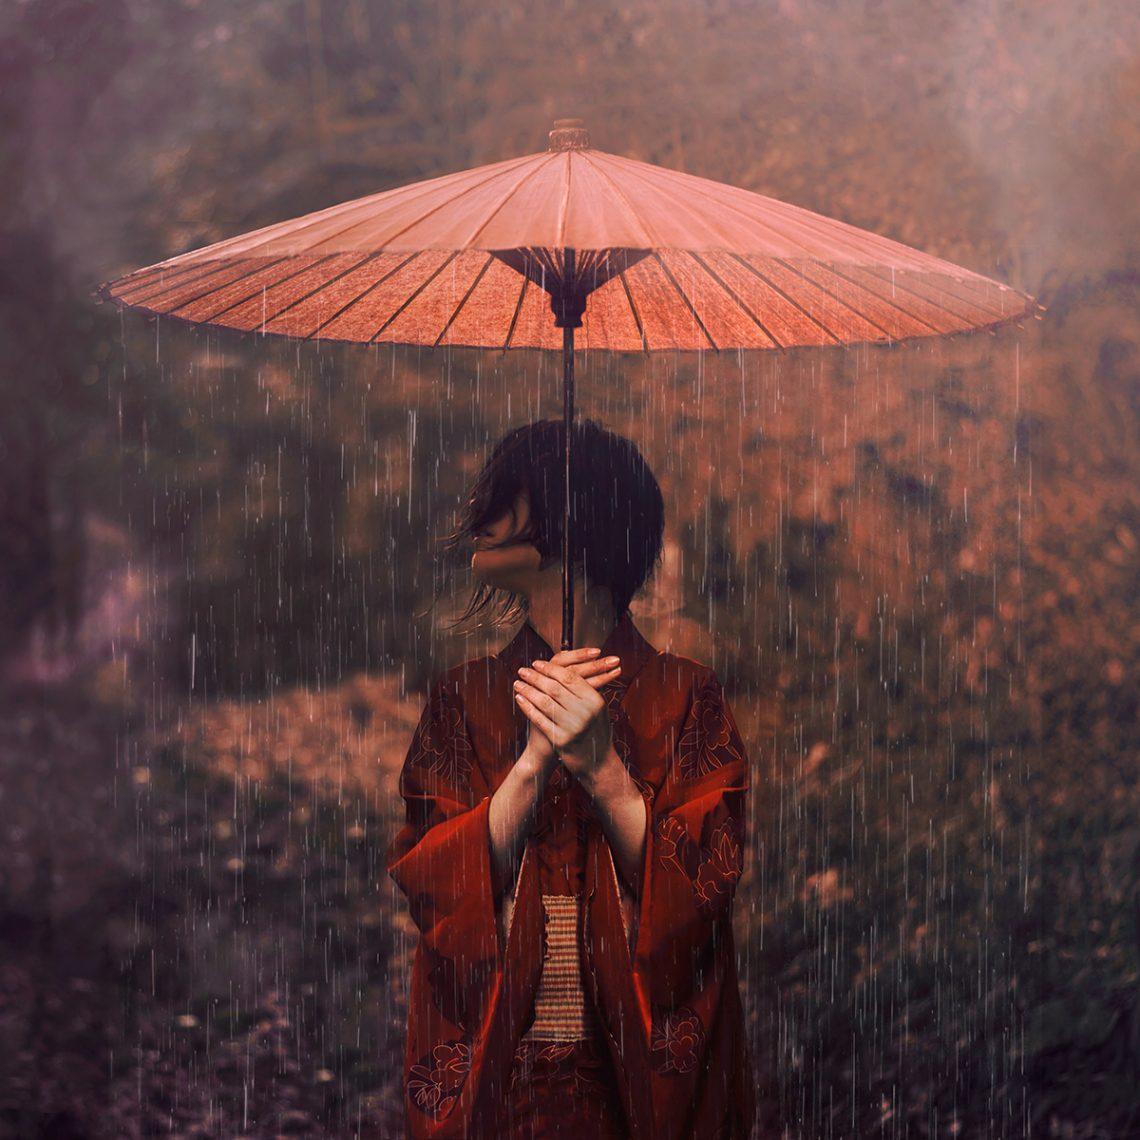 Reylia_Slaby_Photography_beautifulbizarre (1)